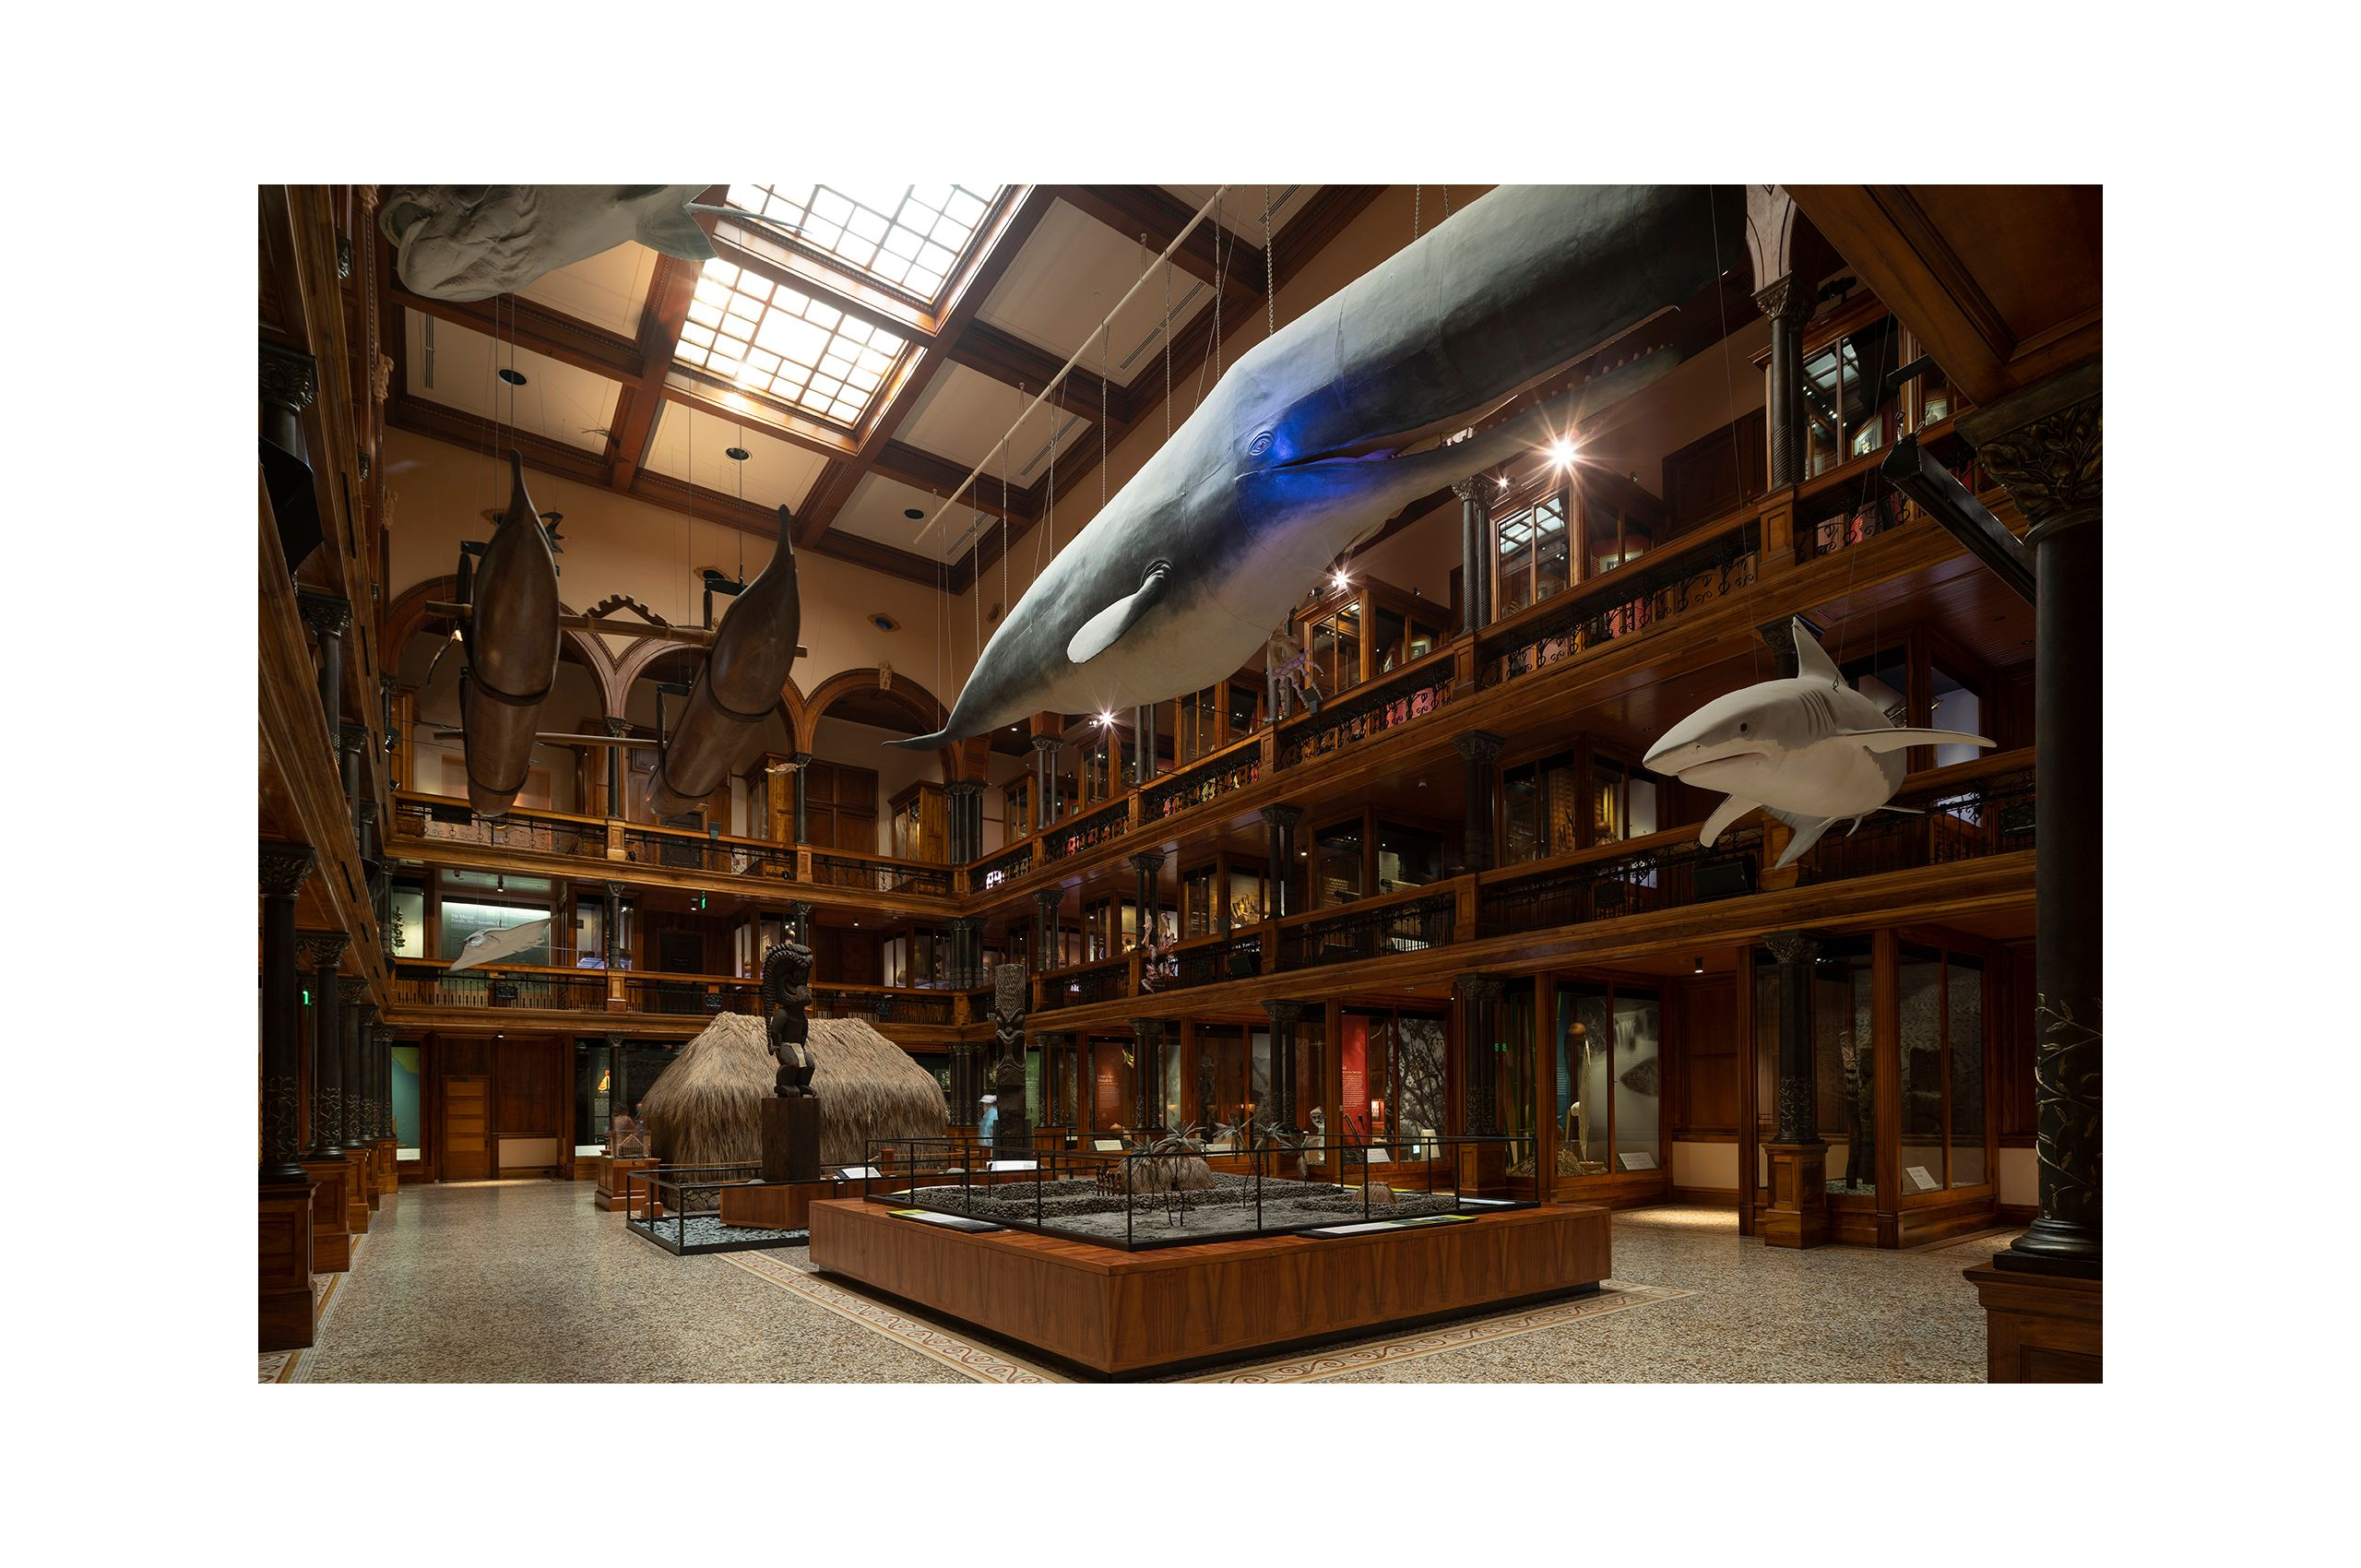 NEWLIVEBOOKS-BishopMuseum2.jpg